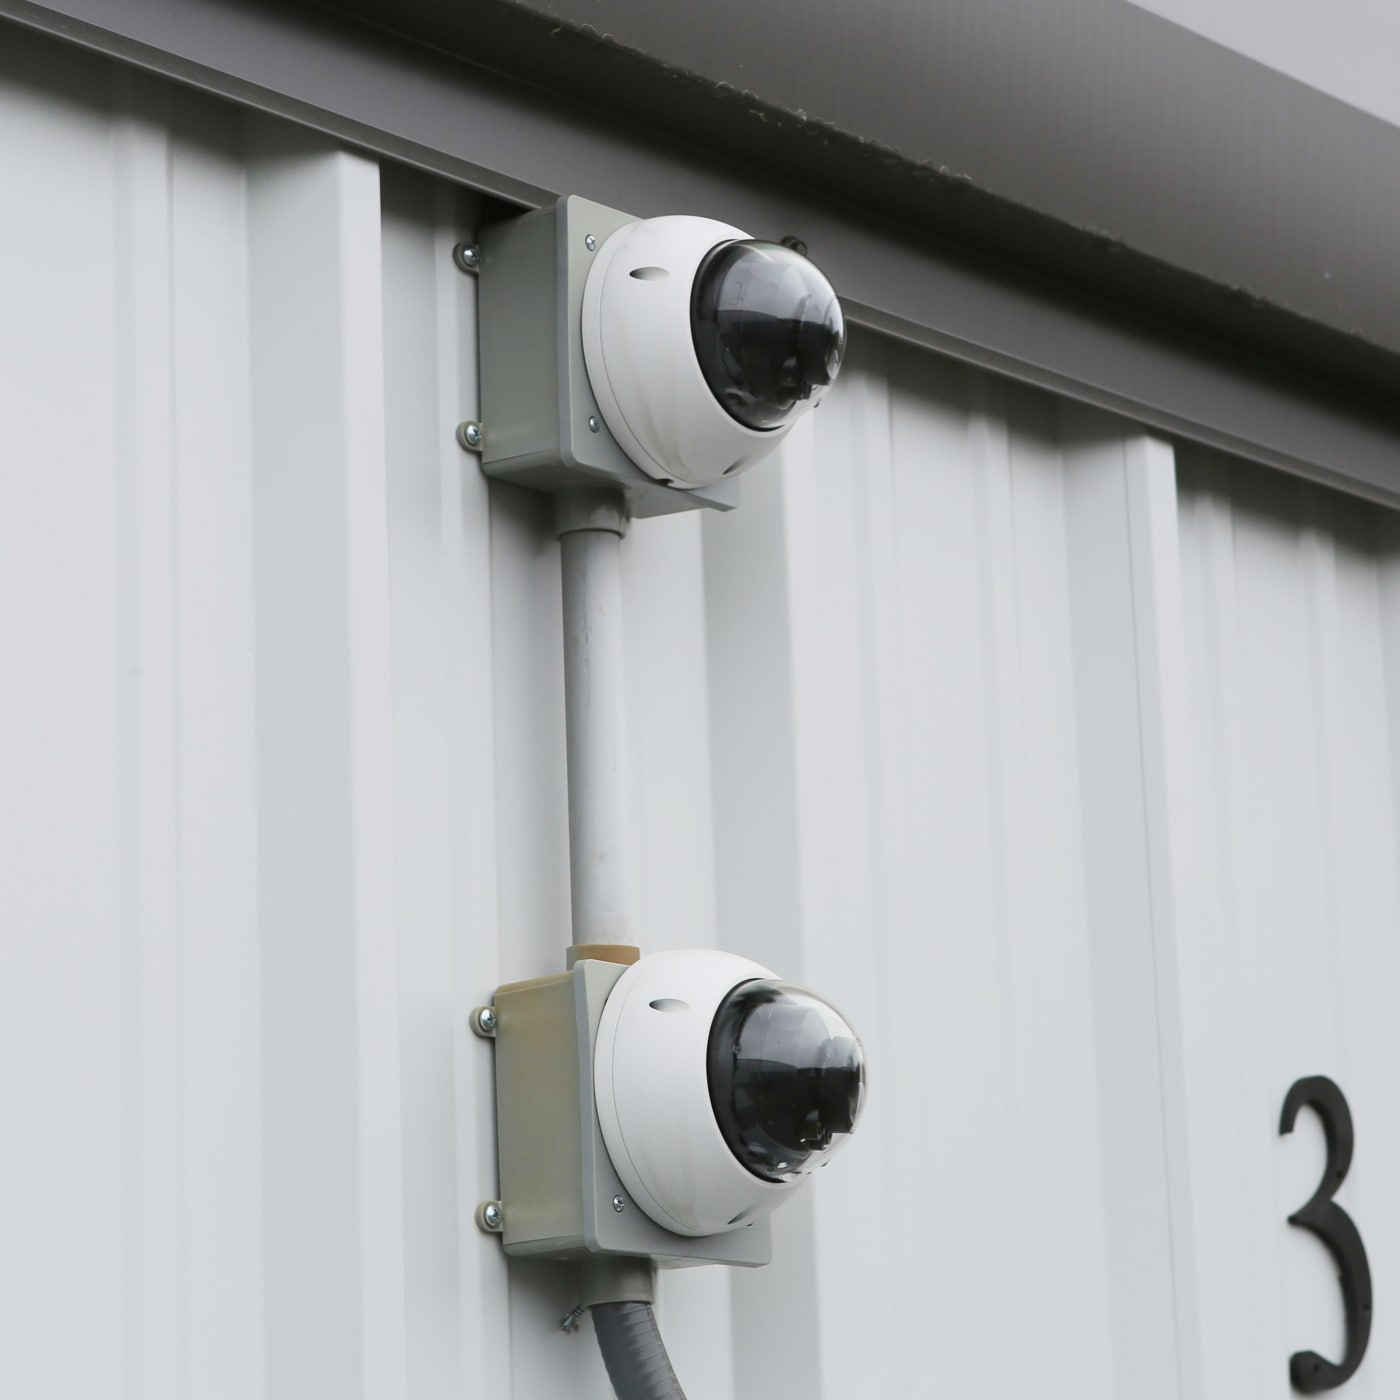 Security camera at Midgard Self Storage in Lake Wylie, South Carolina